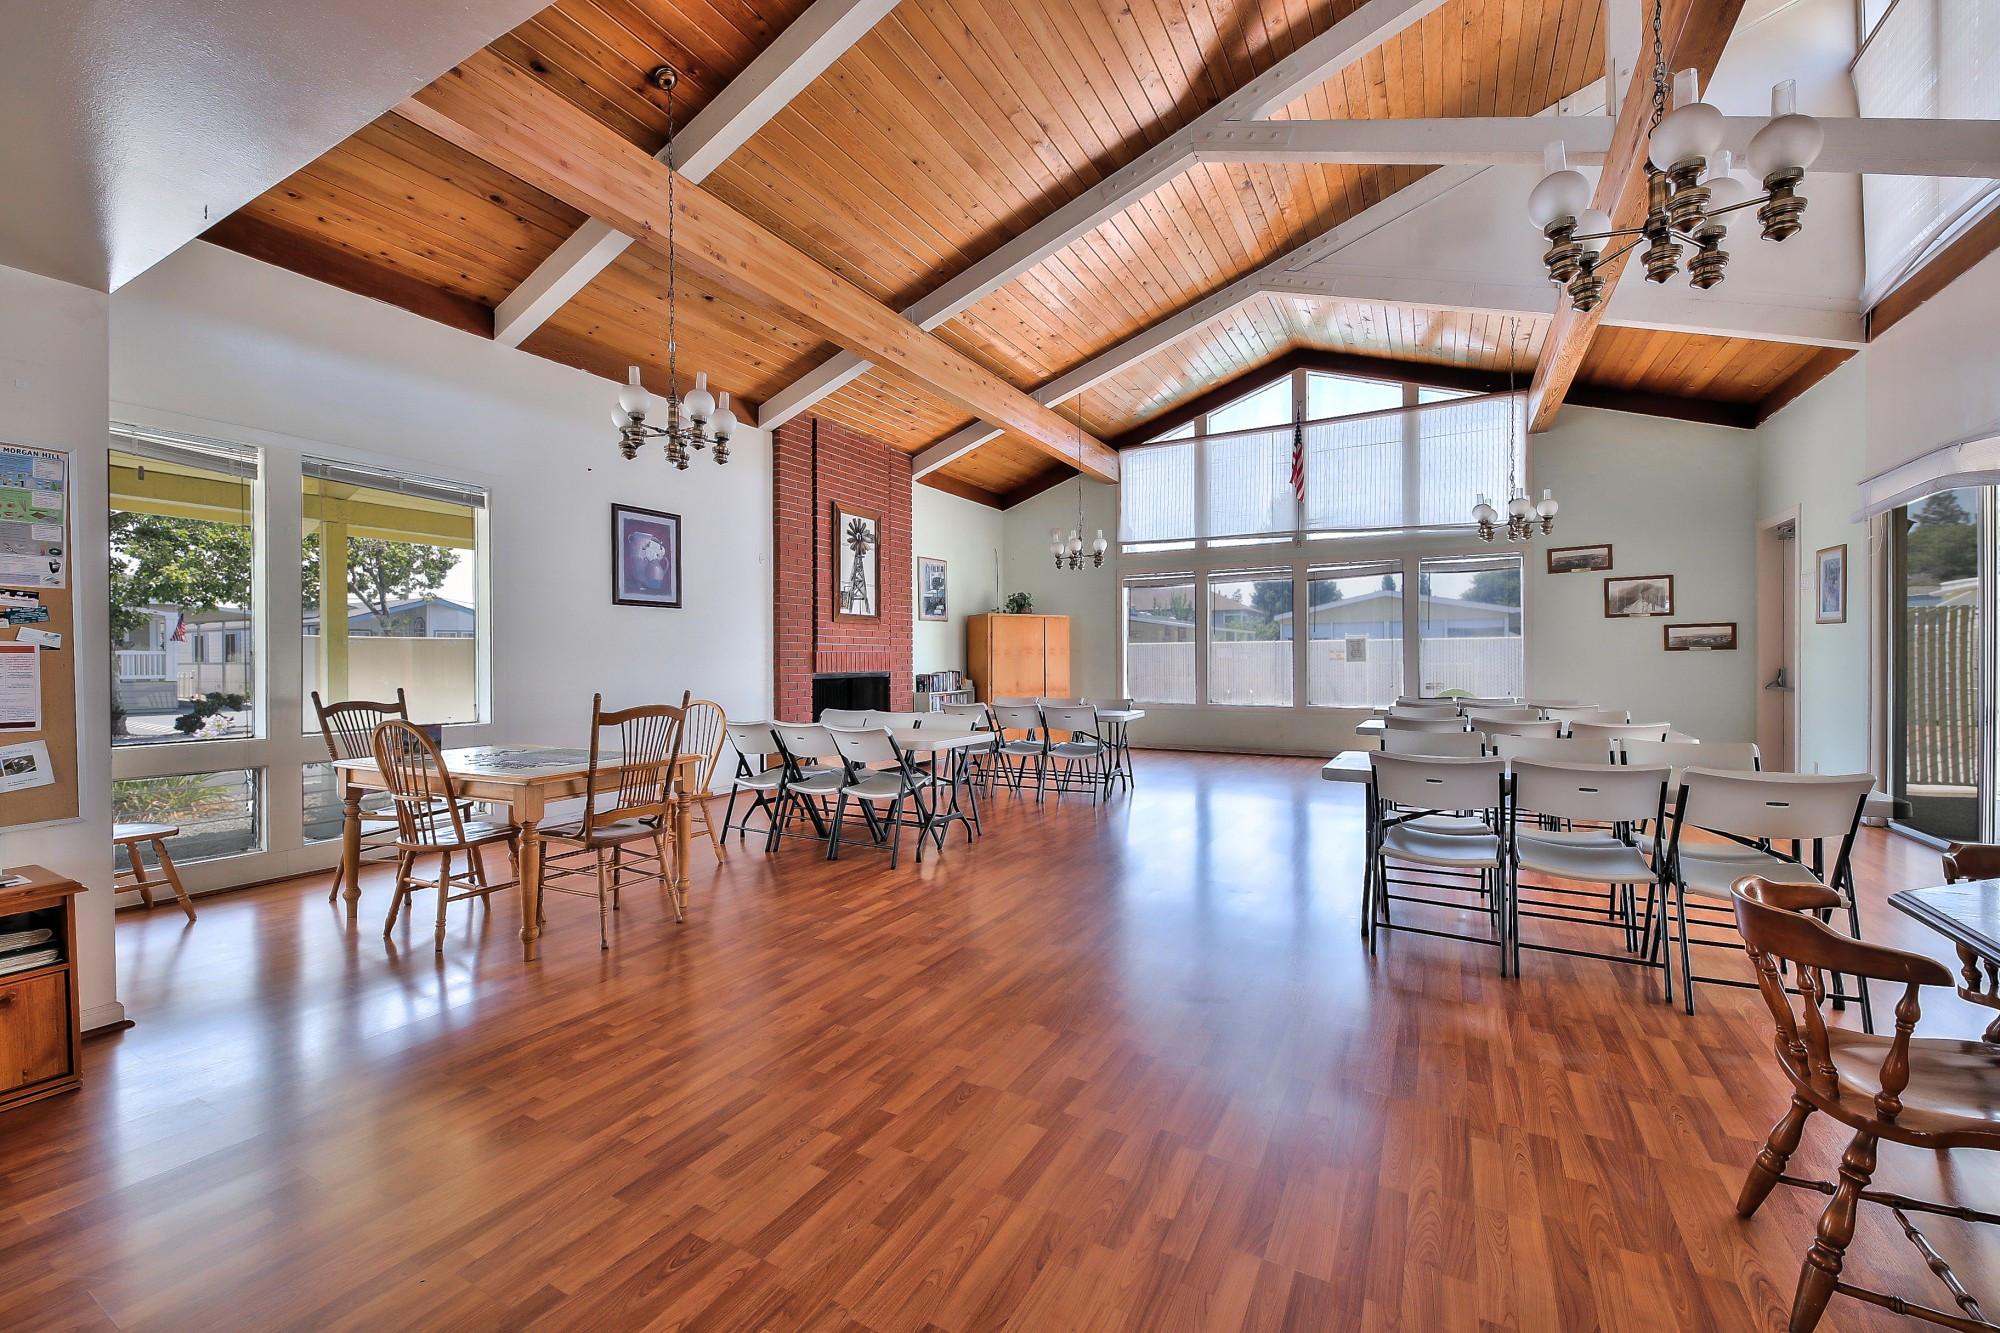 hardwood floor repair san jose of san jose real estate sunnyvale homes hayward investment property pertaining to 575 san pedro ave morgan hill ca 95037